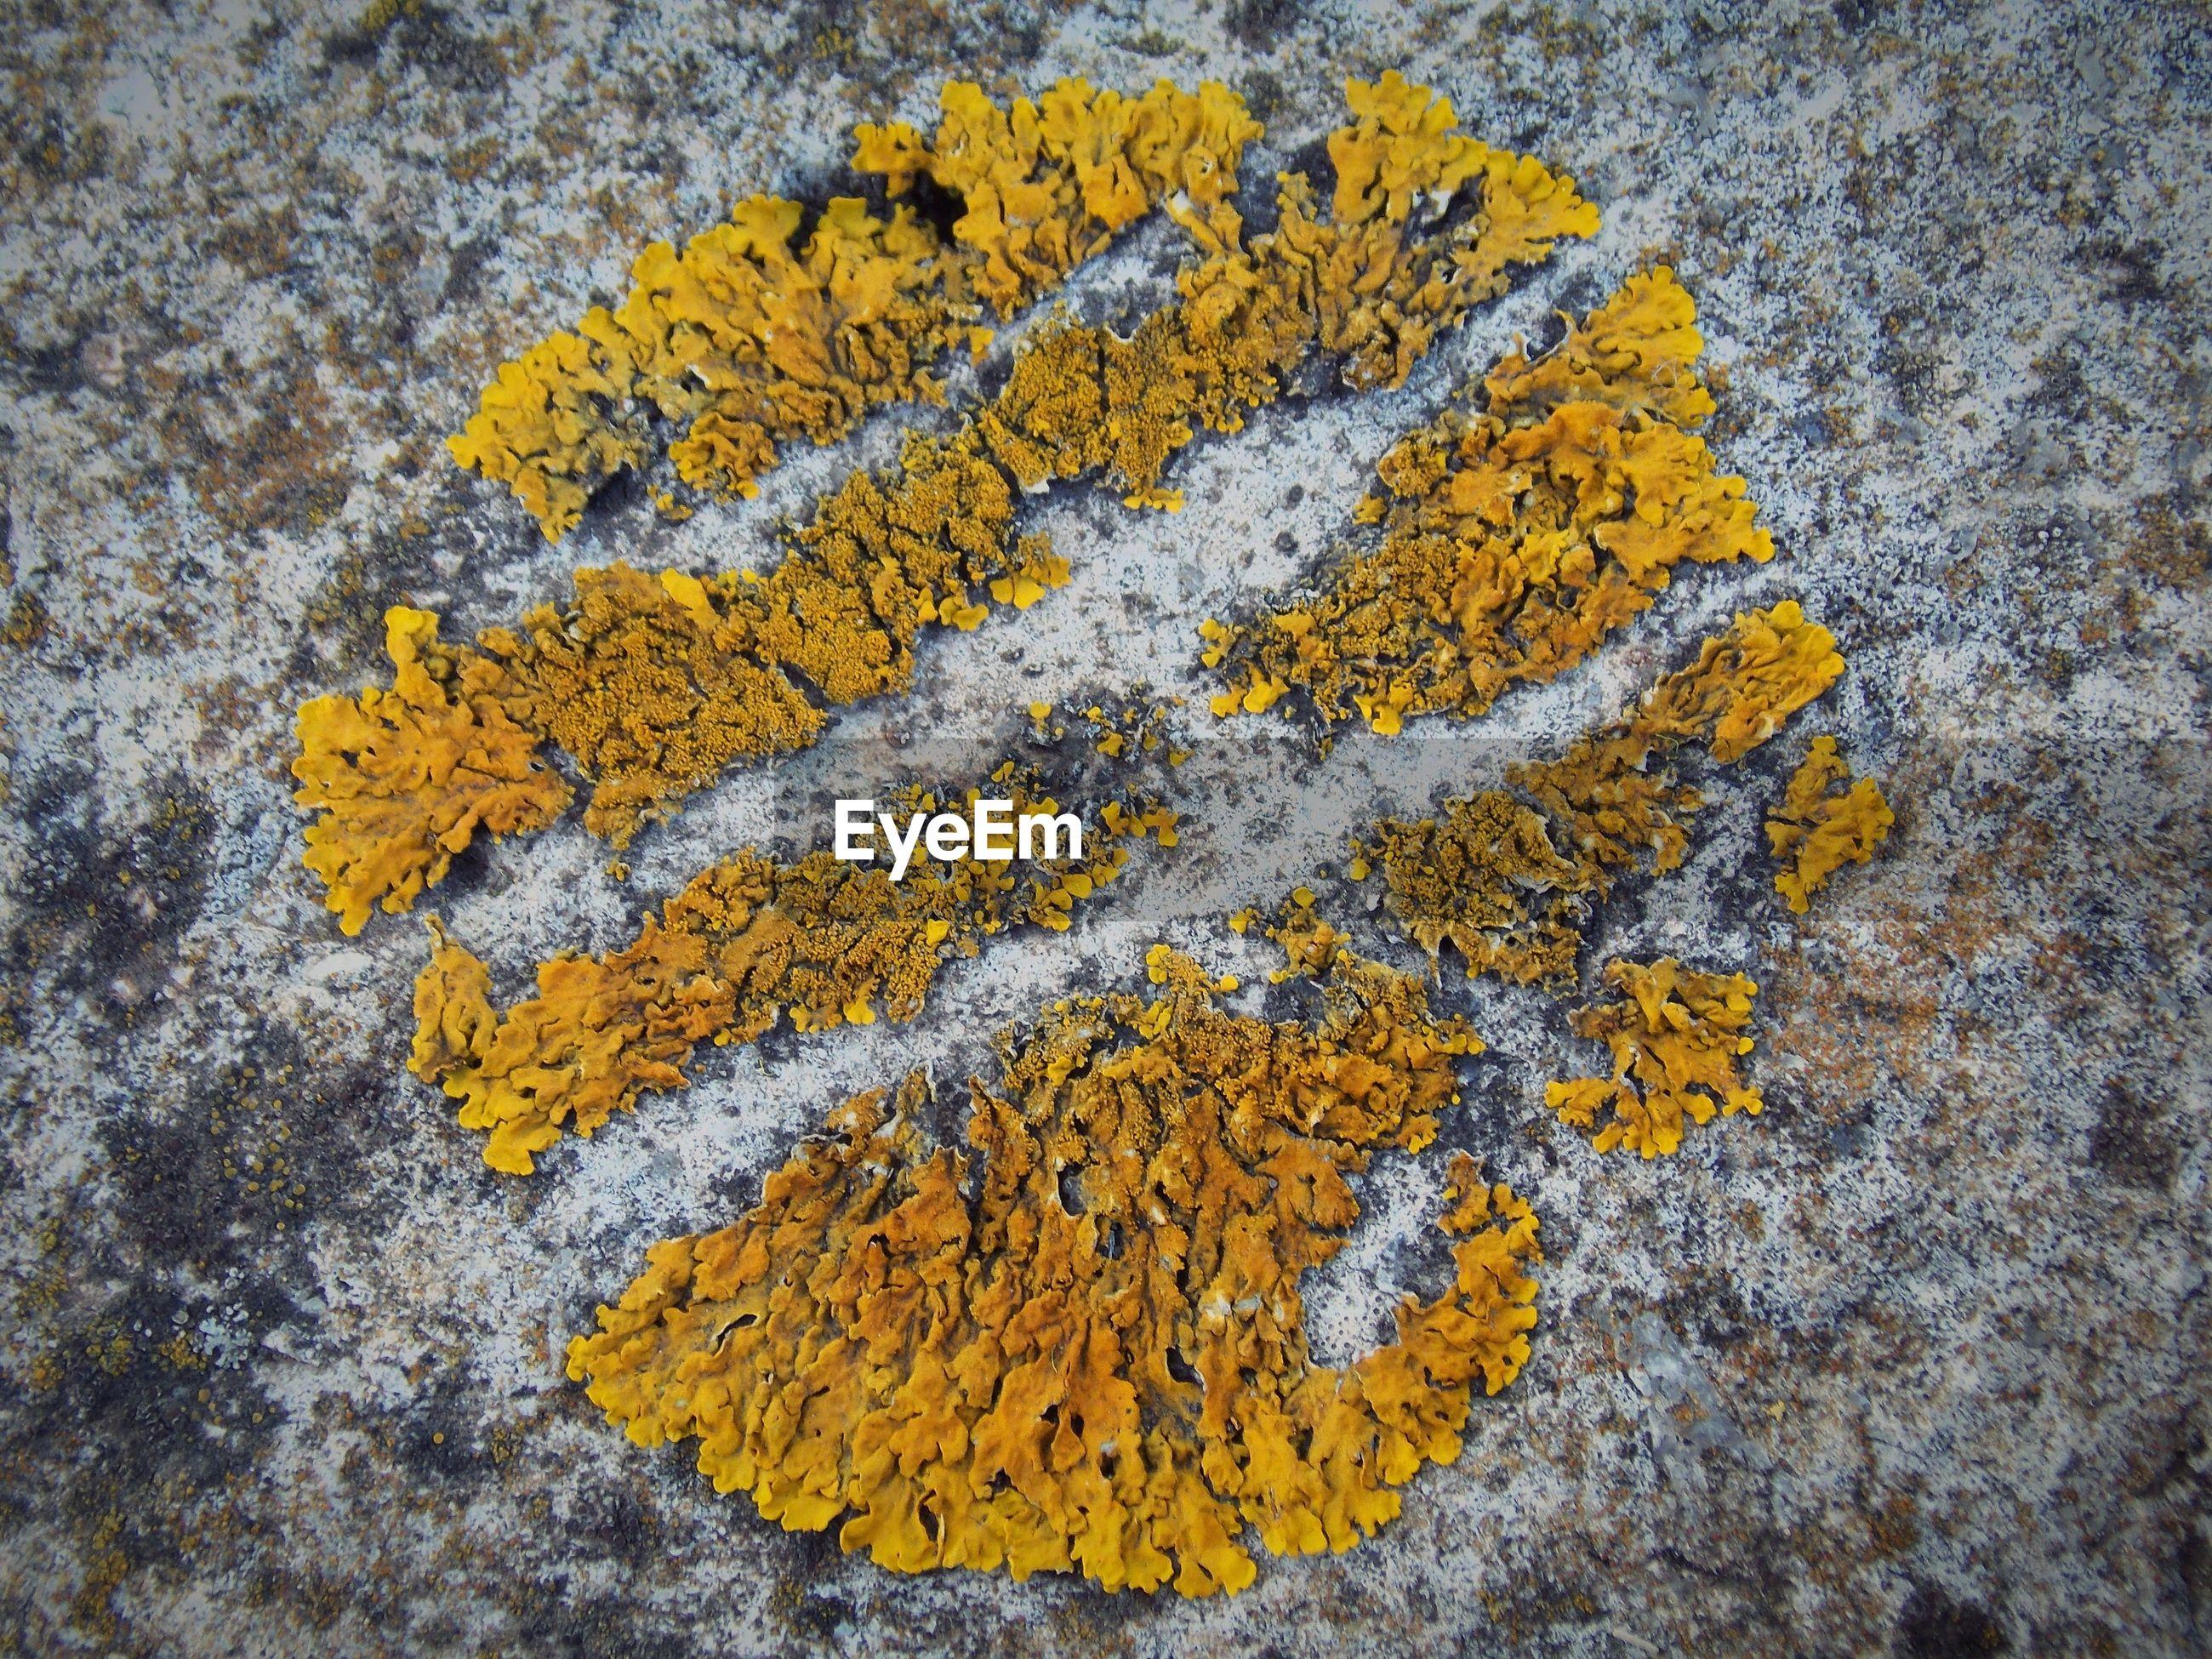 Close-up of yellow petals on rock